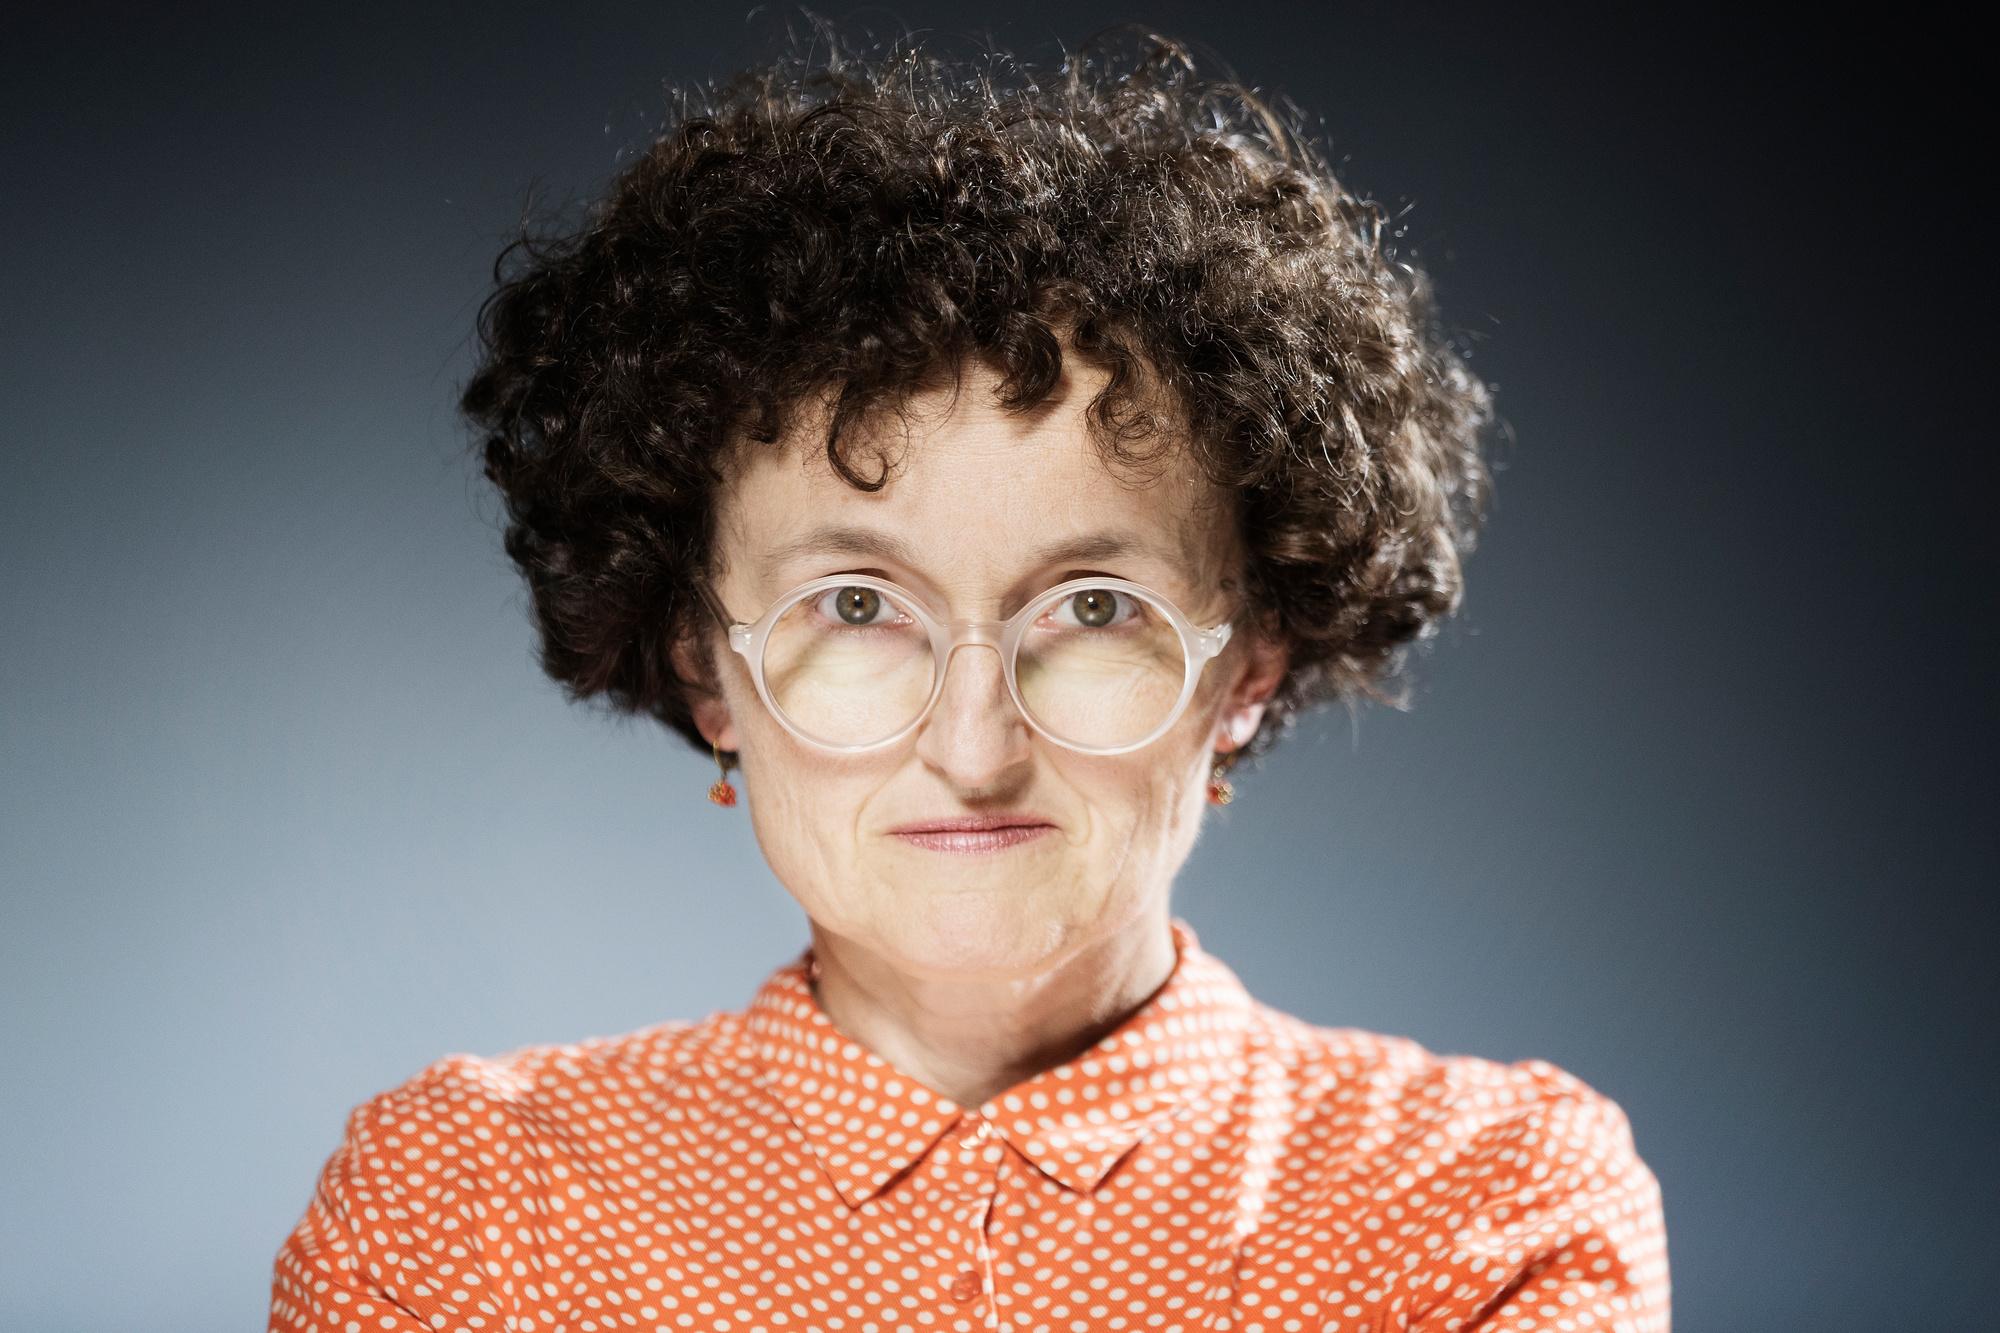 Marie-Hélène Lafon, Joël Saget/AFP